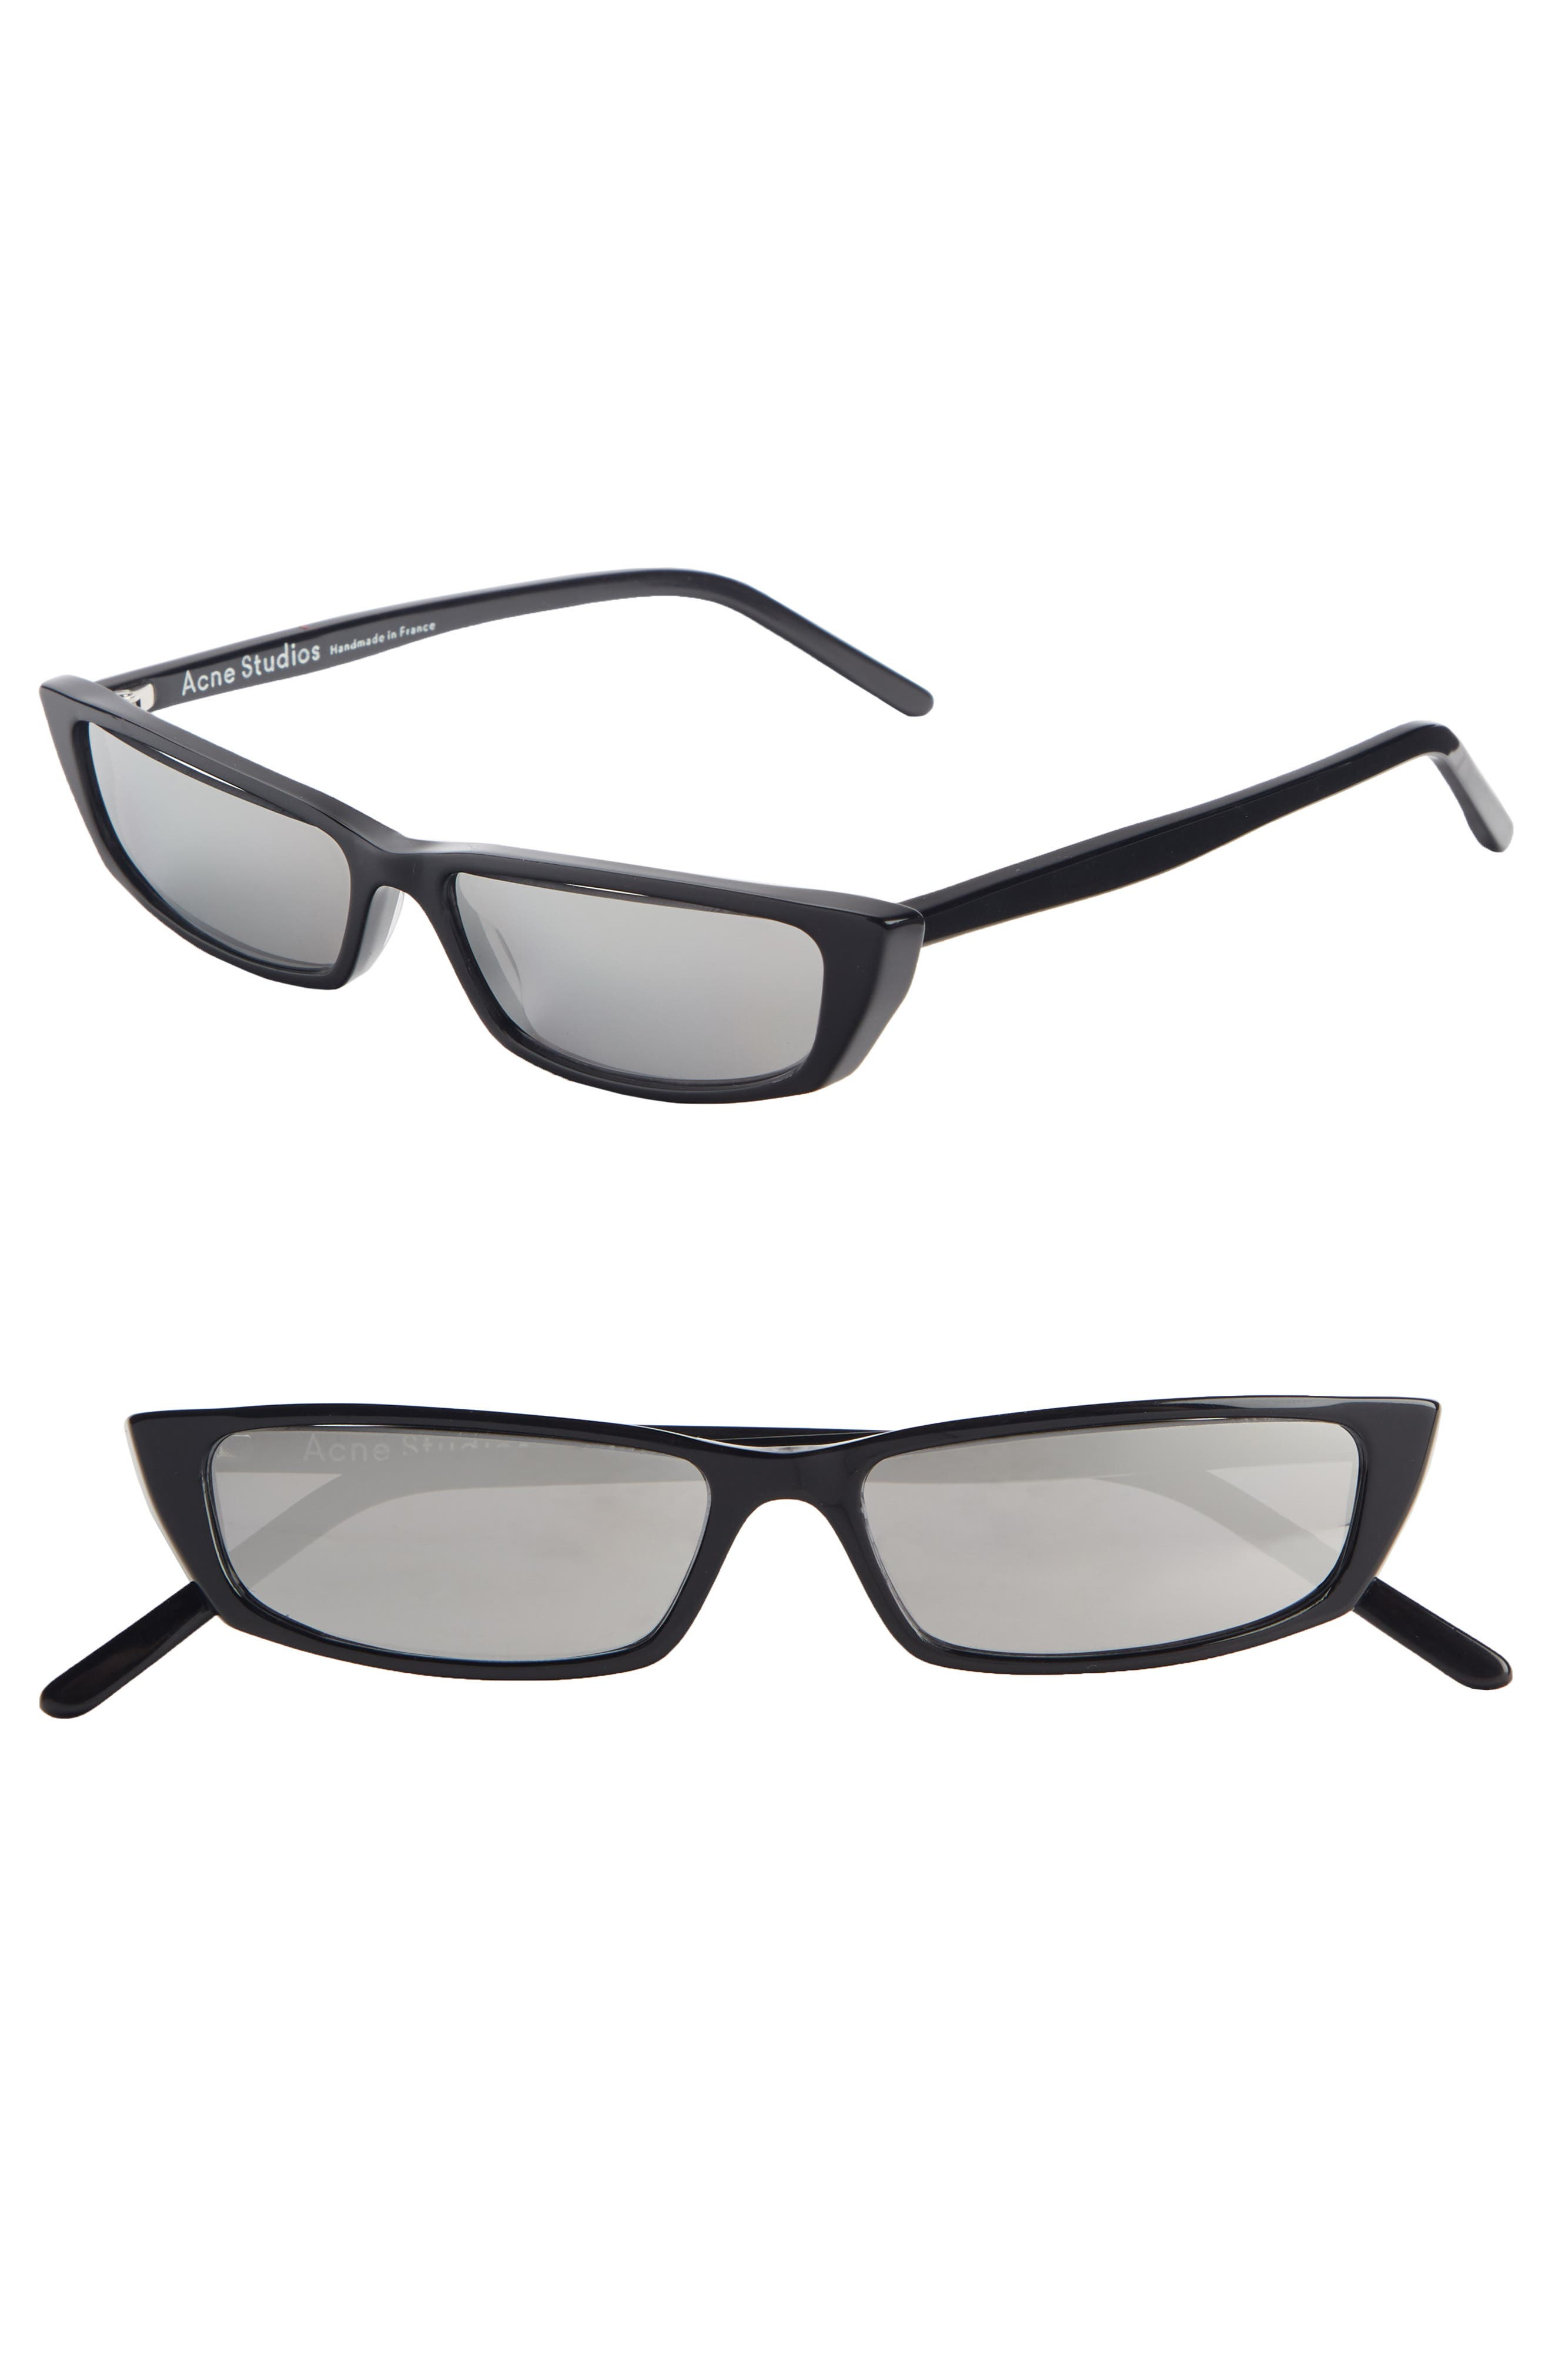 71ddff5f022 Acne Studios Sunglasses for Women